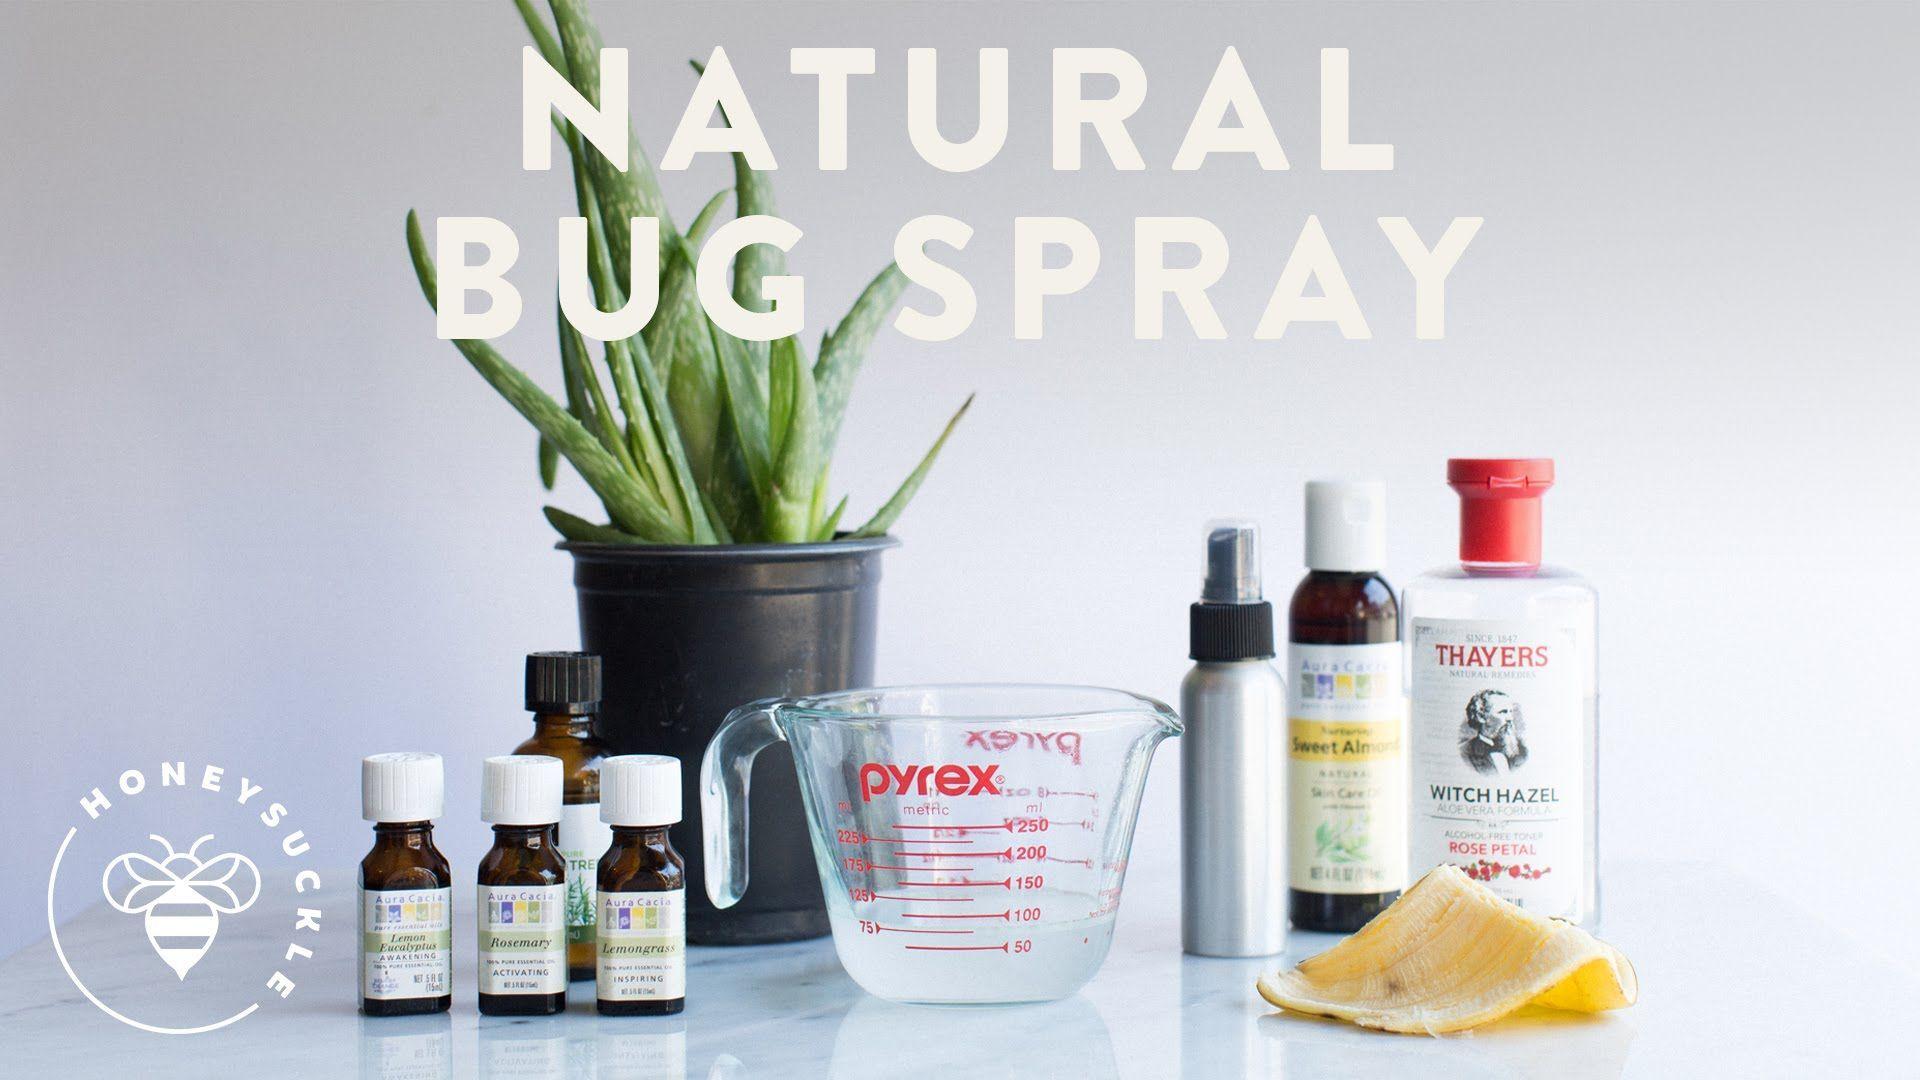 Pin by Rebecca Huls on Dog ideas Natural bug spray